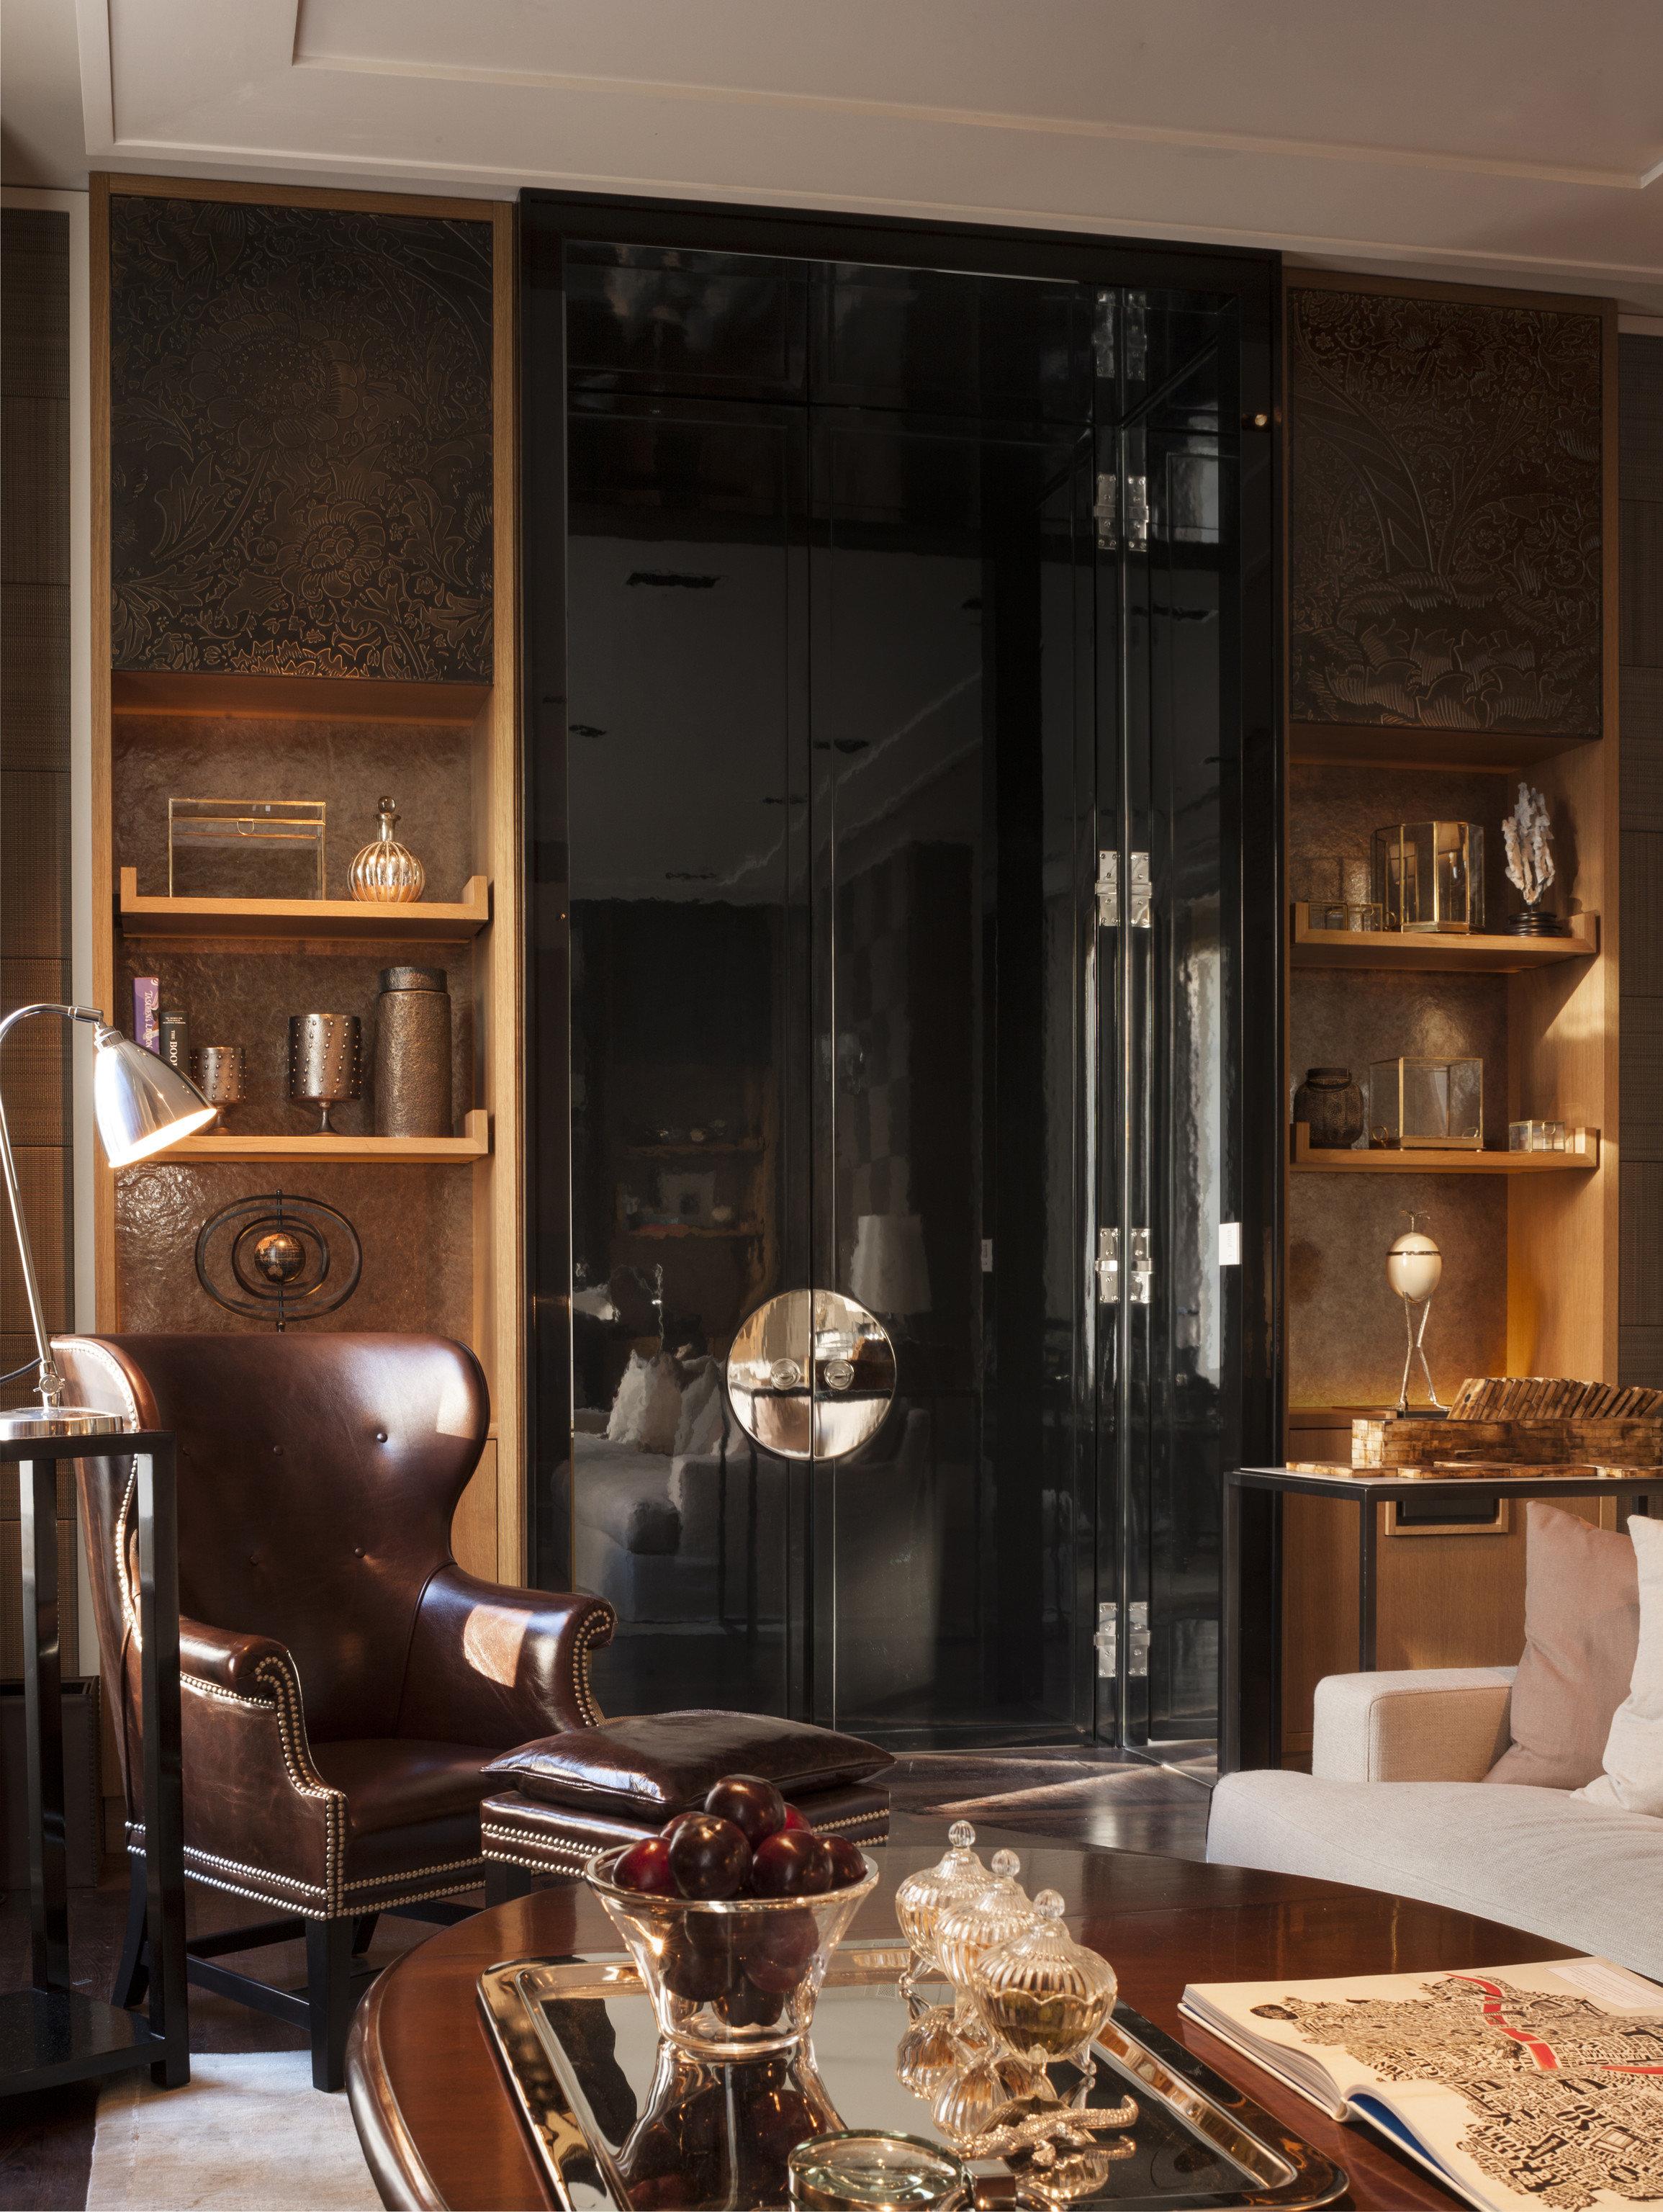 Hotels Luxury Travel indoor furniture room interior design living room window dining table dining room